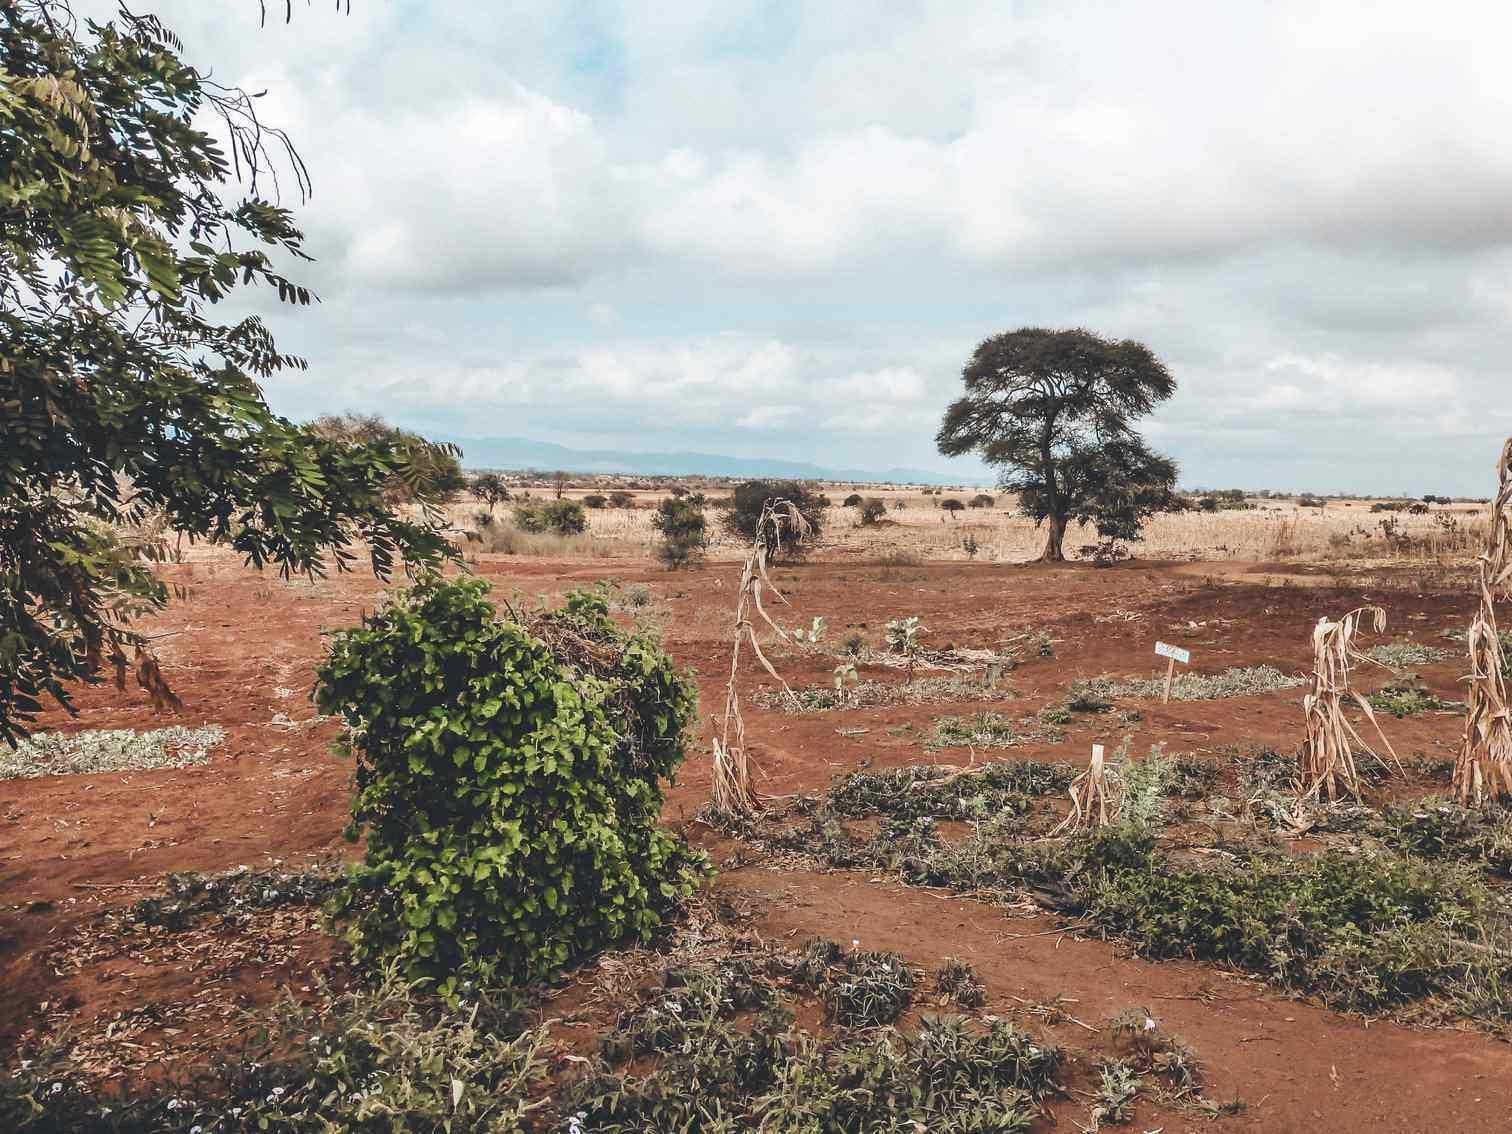 View from Tanzanian School